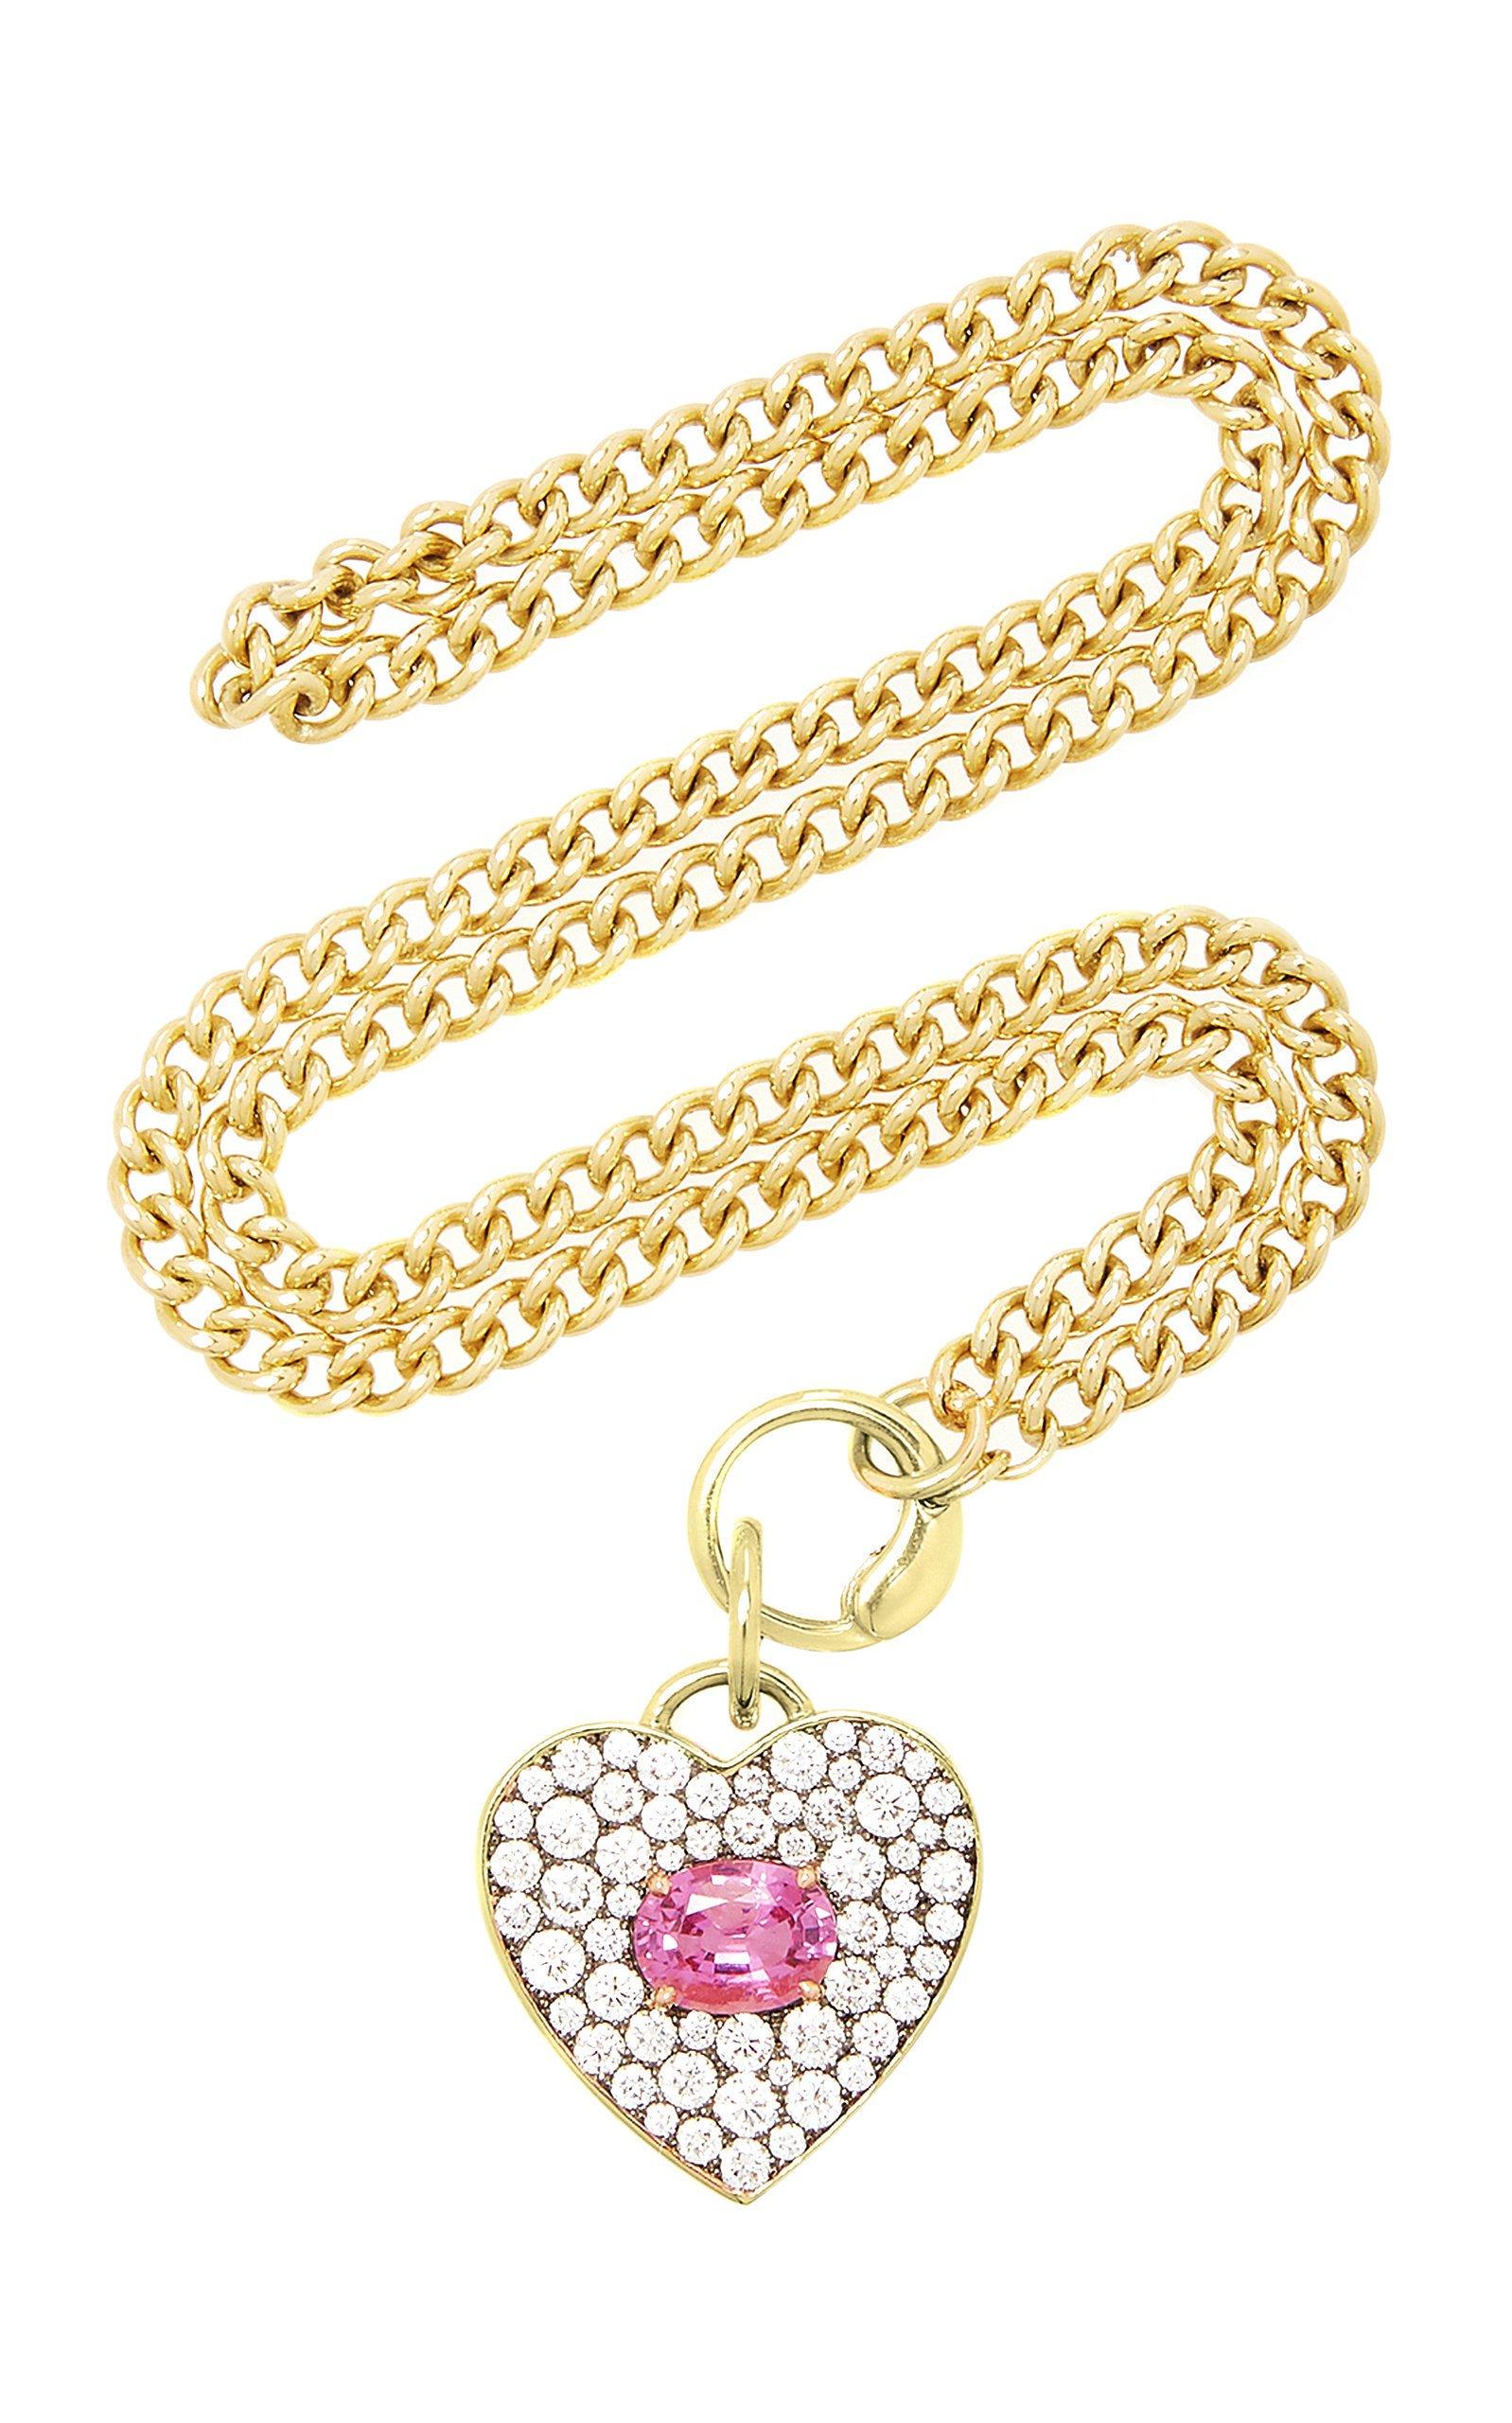 Jemma Wynne 18K Yellow Tourjours Pink Sapphire Heart Necklace